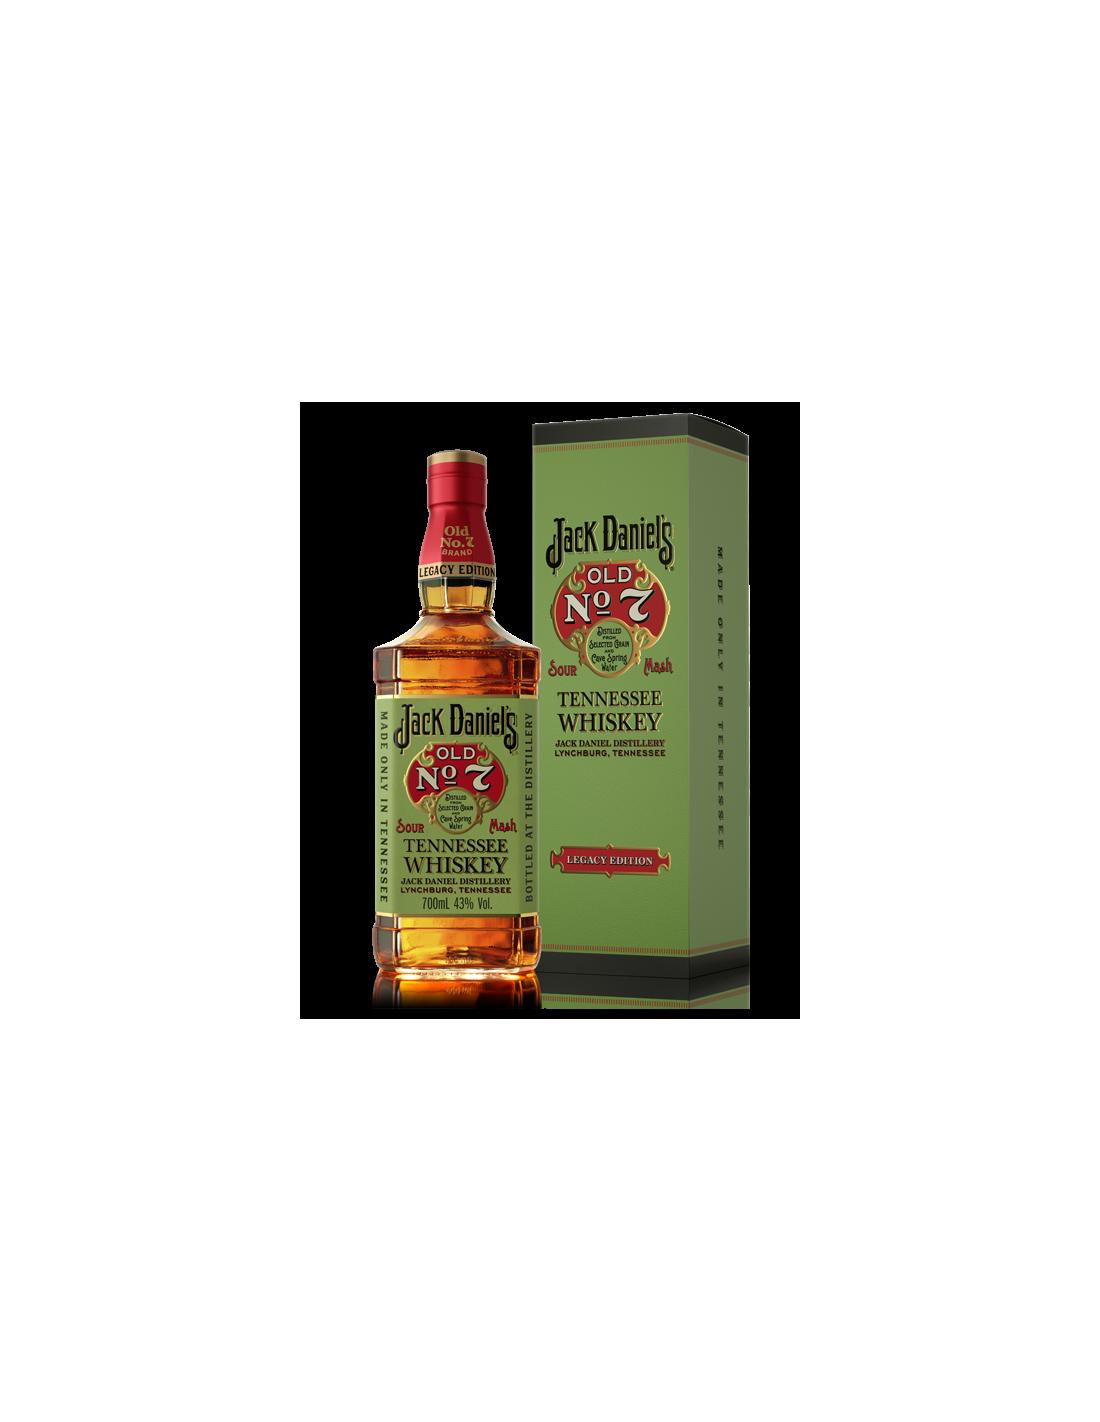 Whisky Bourbon Jack Daniel's 1905 Legacy, 43% alc., 0.7L, America